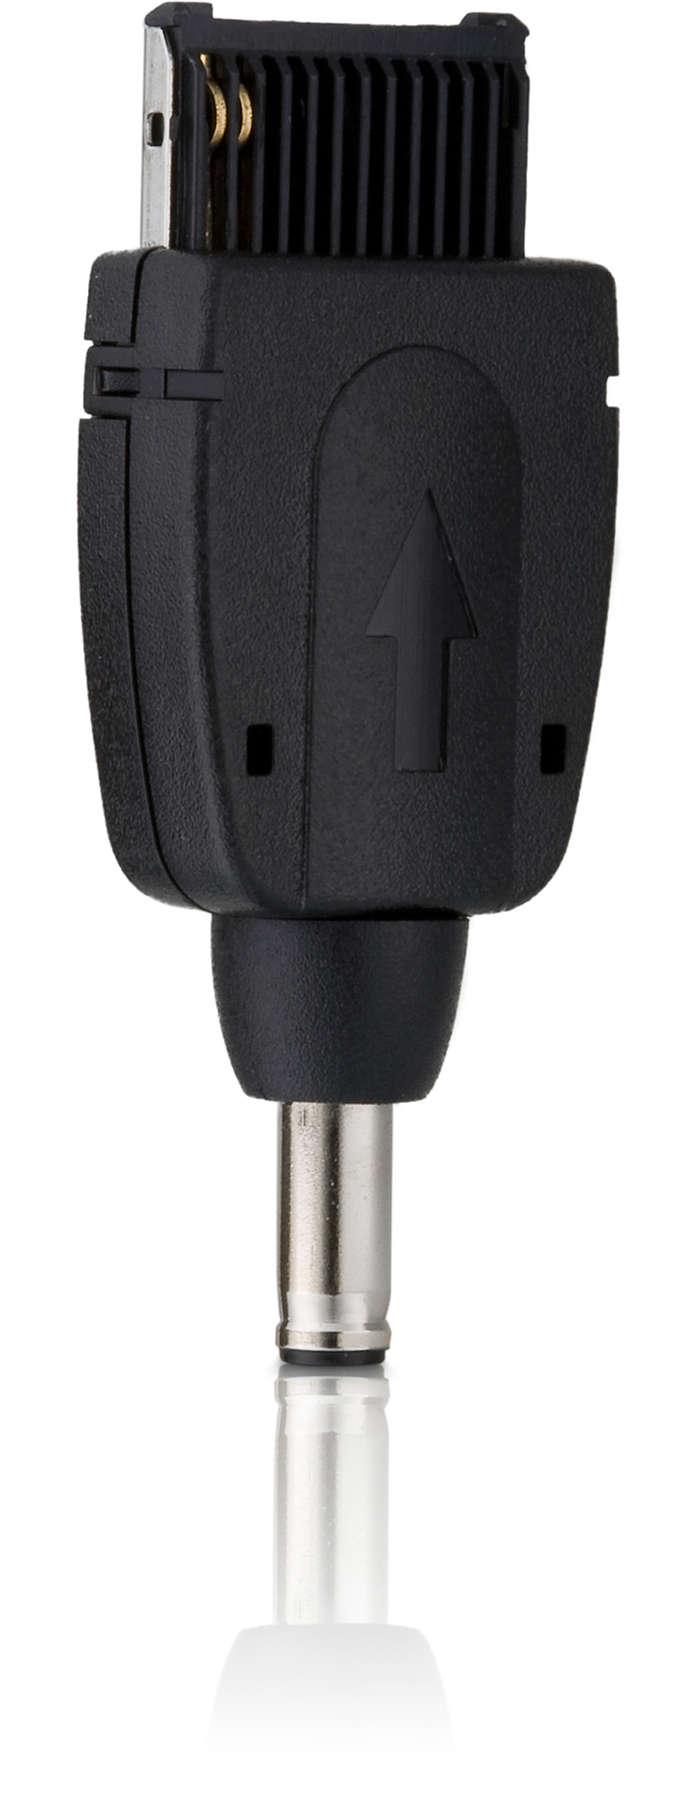 Connector tip for Siemens phones (c)